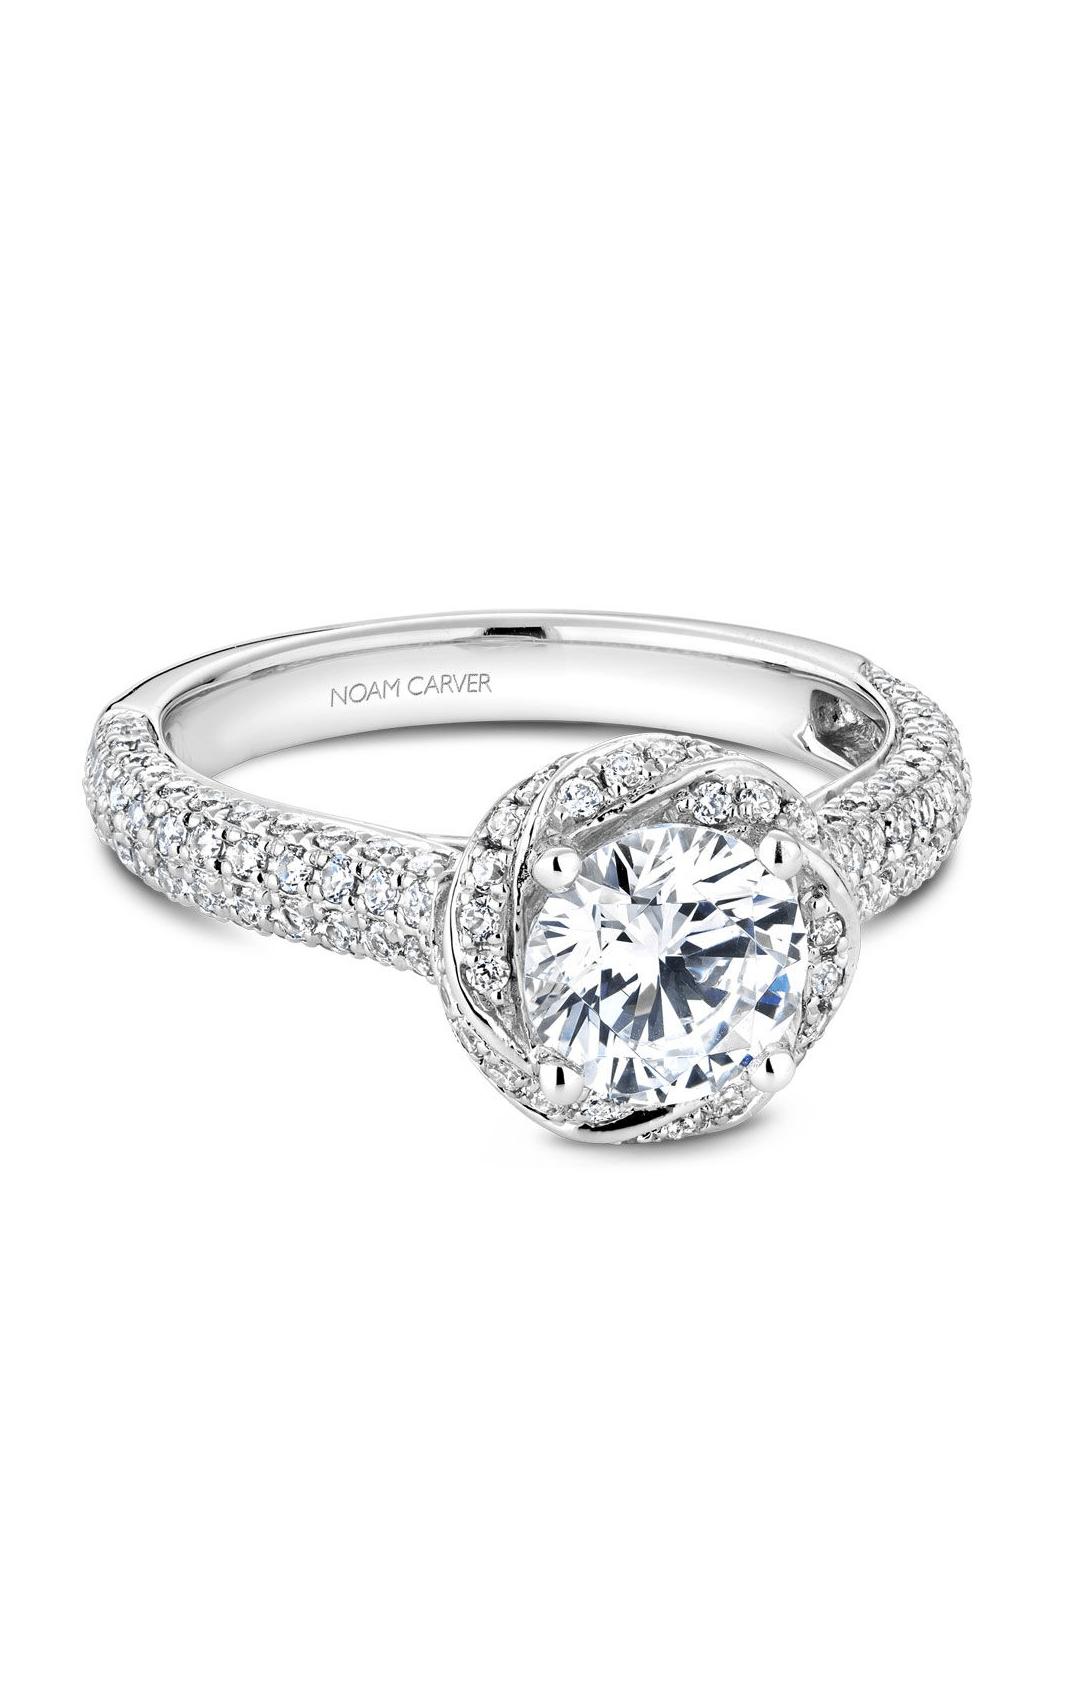 Find Noam Carver B164 01wm Engagement Rings